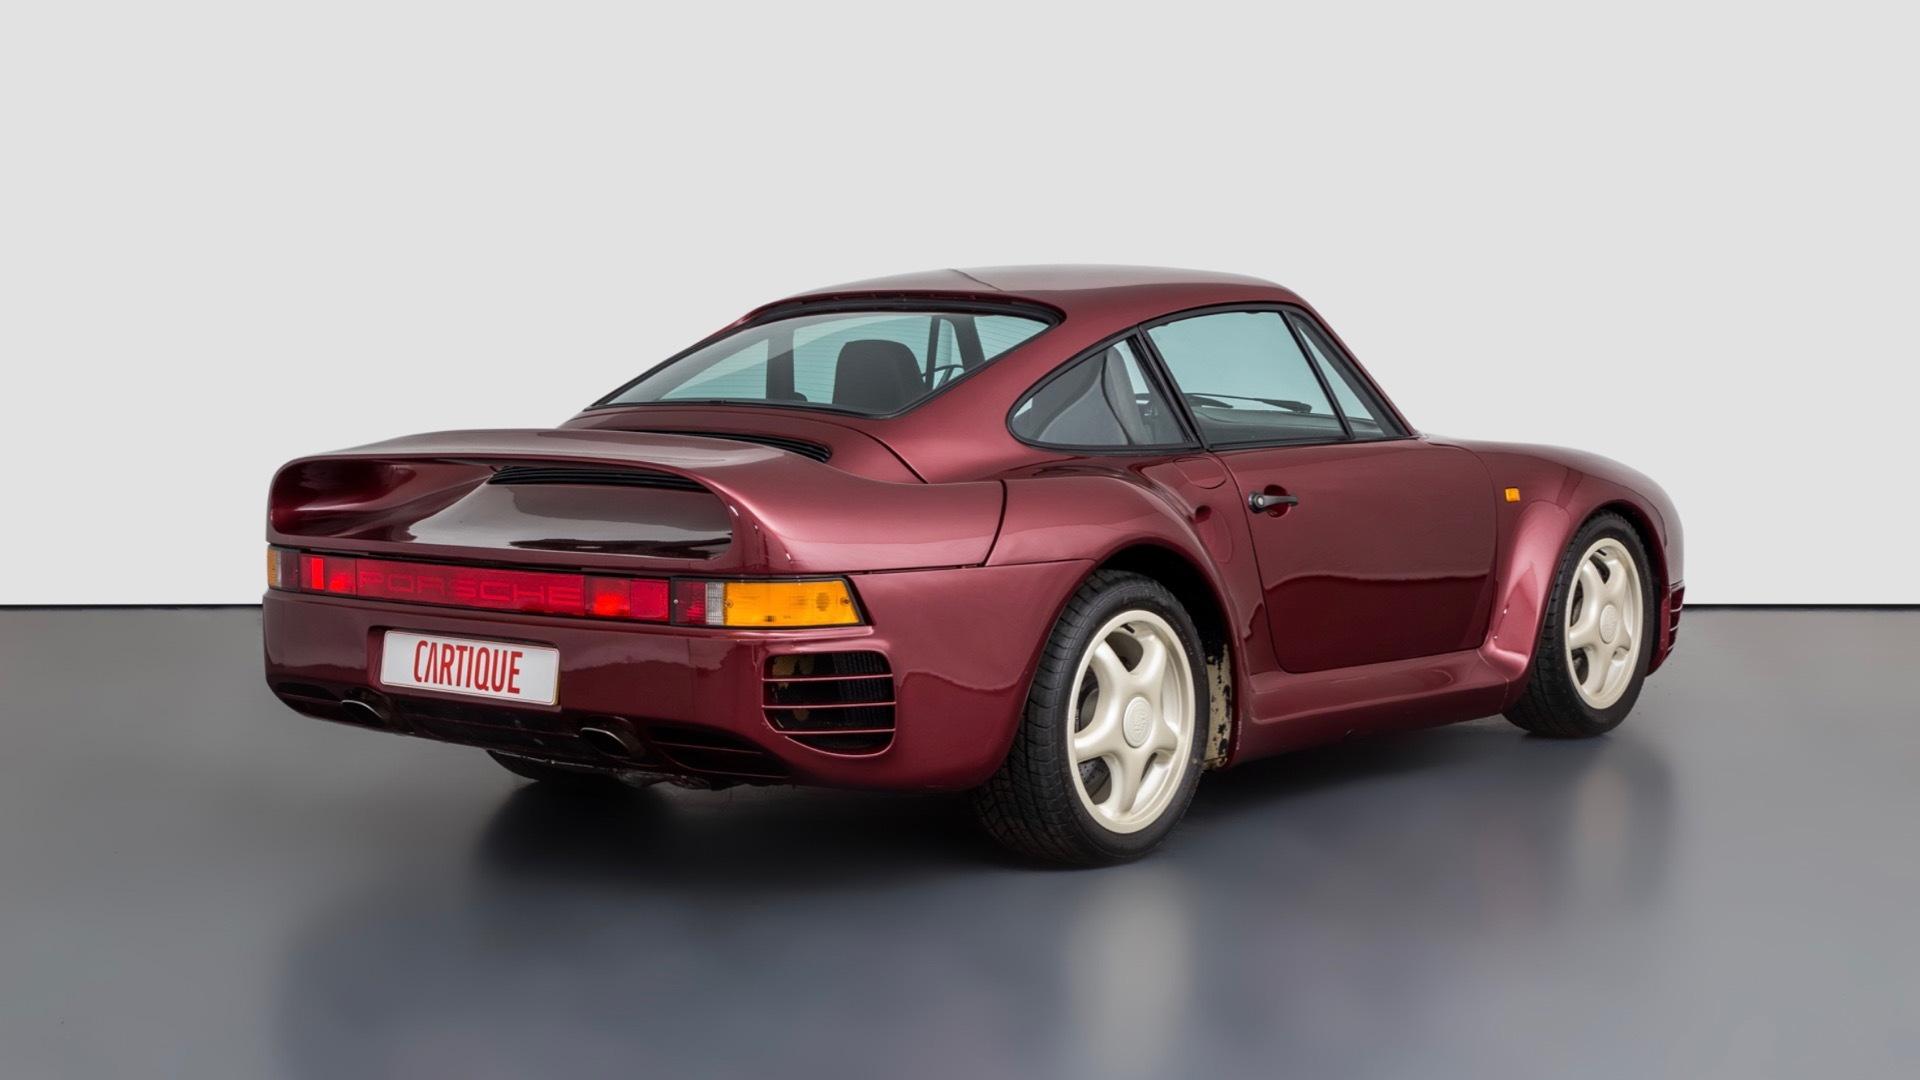 Porsche 959 prototype (photo via Mechatronik)